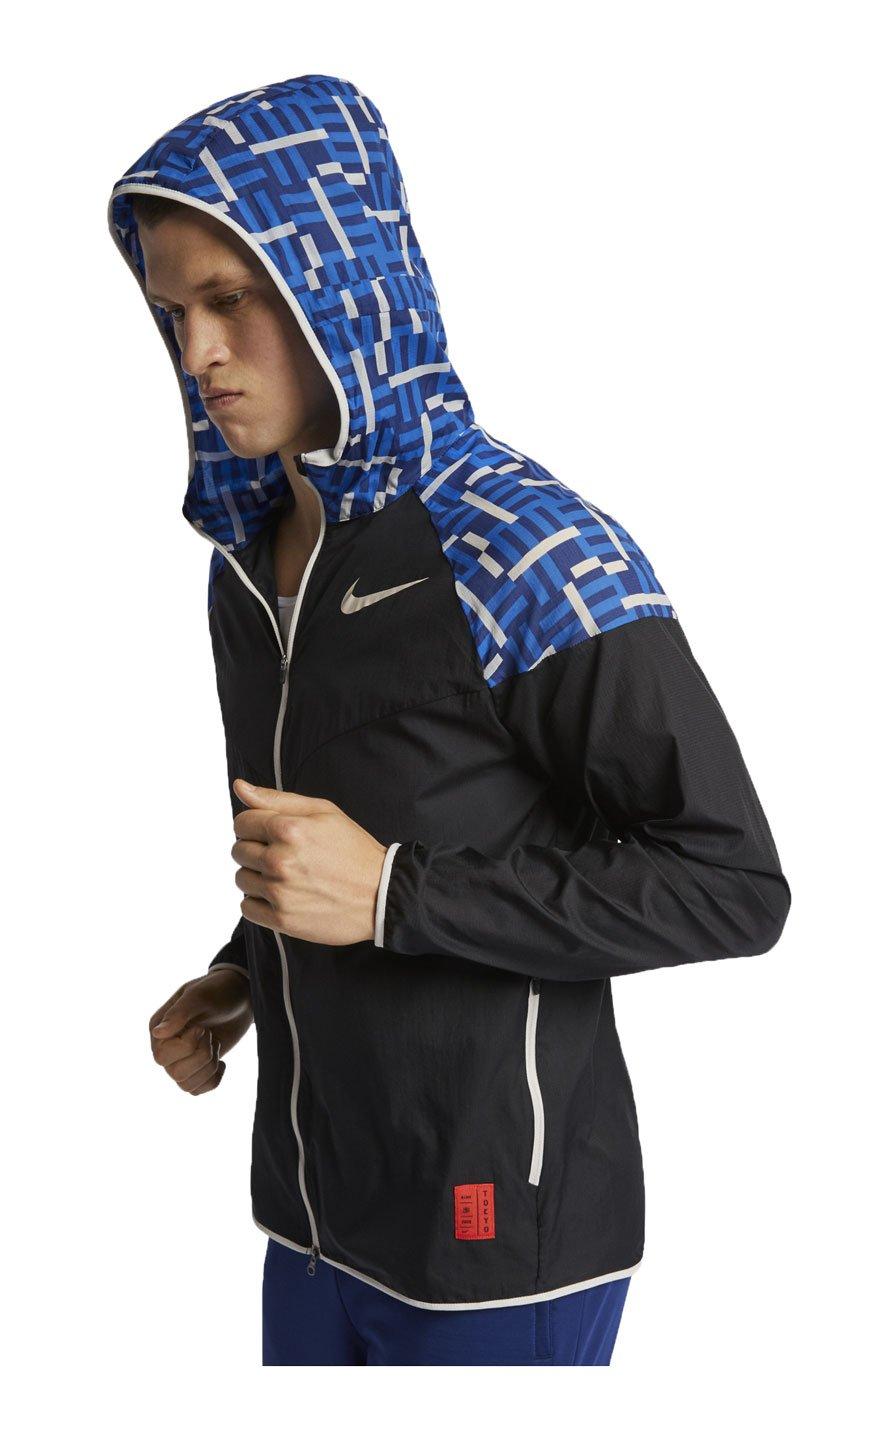 cf3173c6 Куртка Nike Run Windrunner Tokyo | Интернет-магазин Runlab